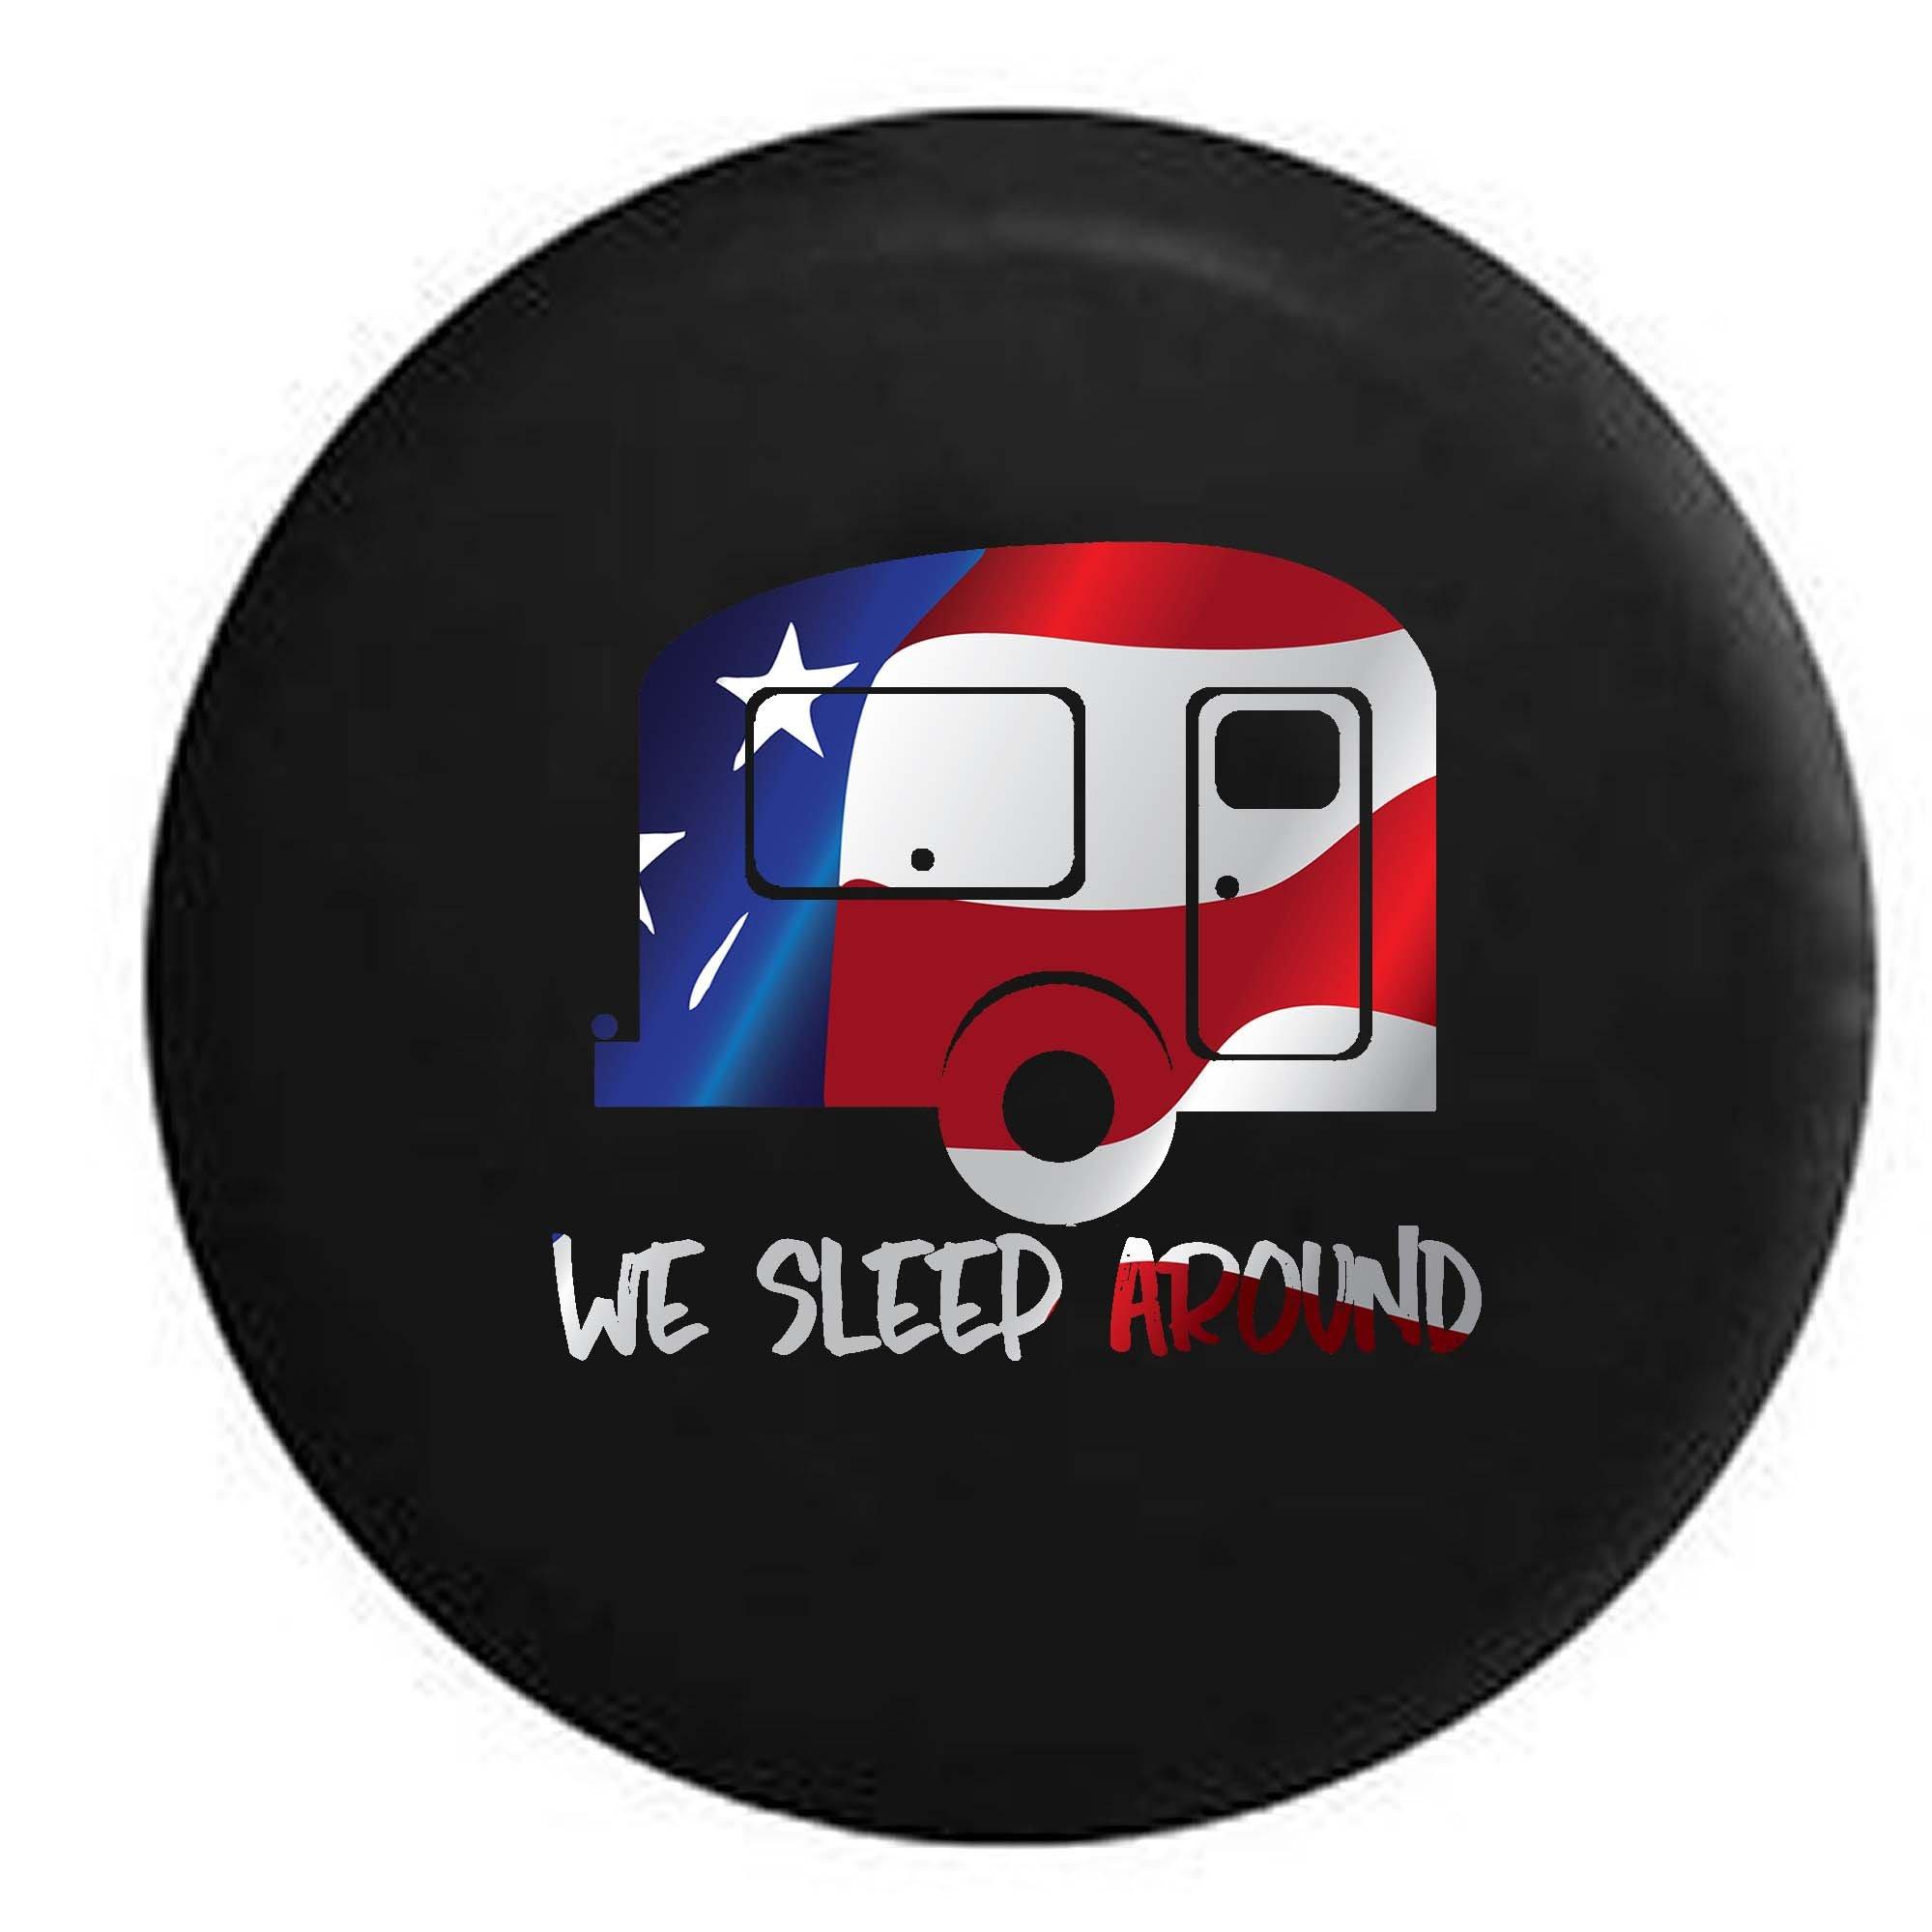 Flag - We Sleep Around Travel Trailer RV Camper Spare Tire Cover OEM Vinyl Black 30 in